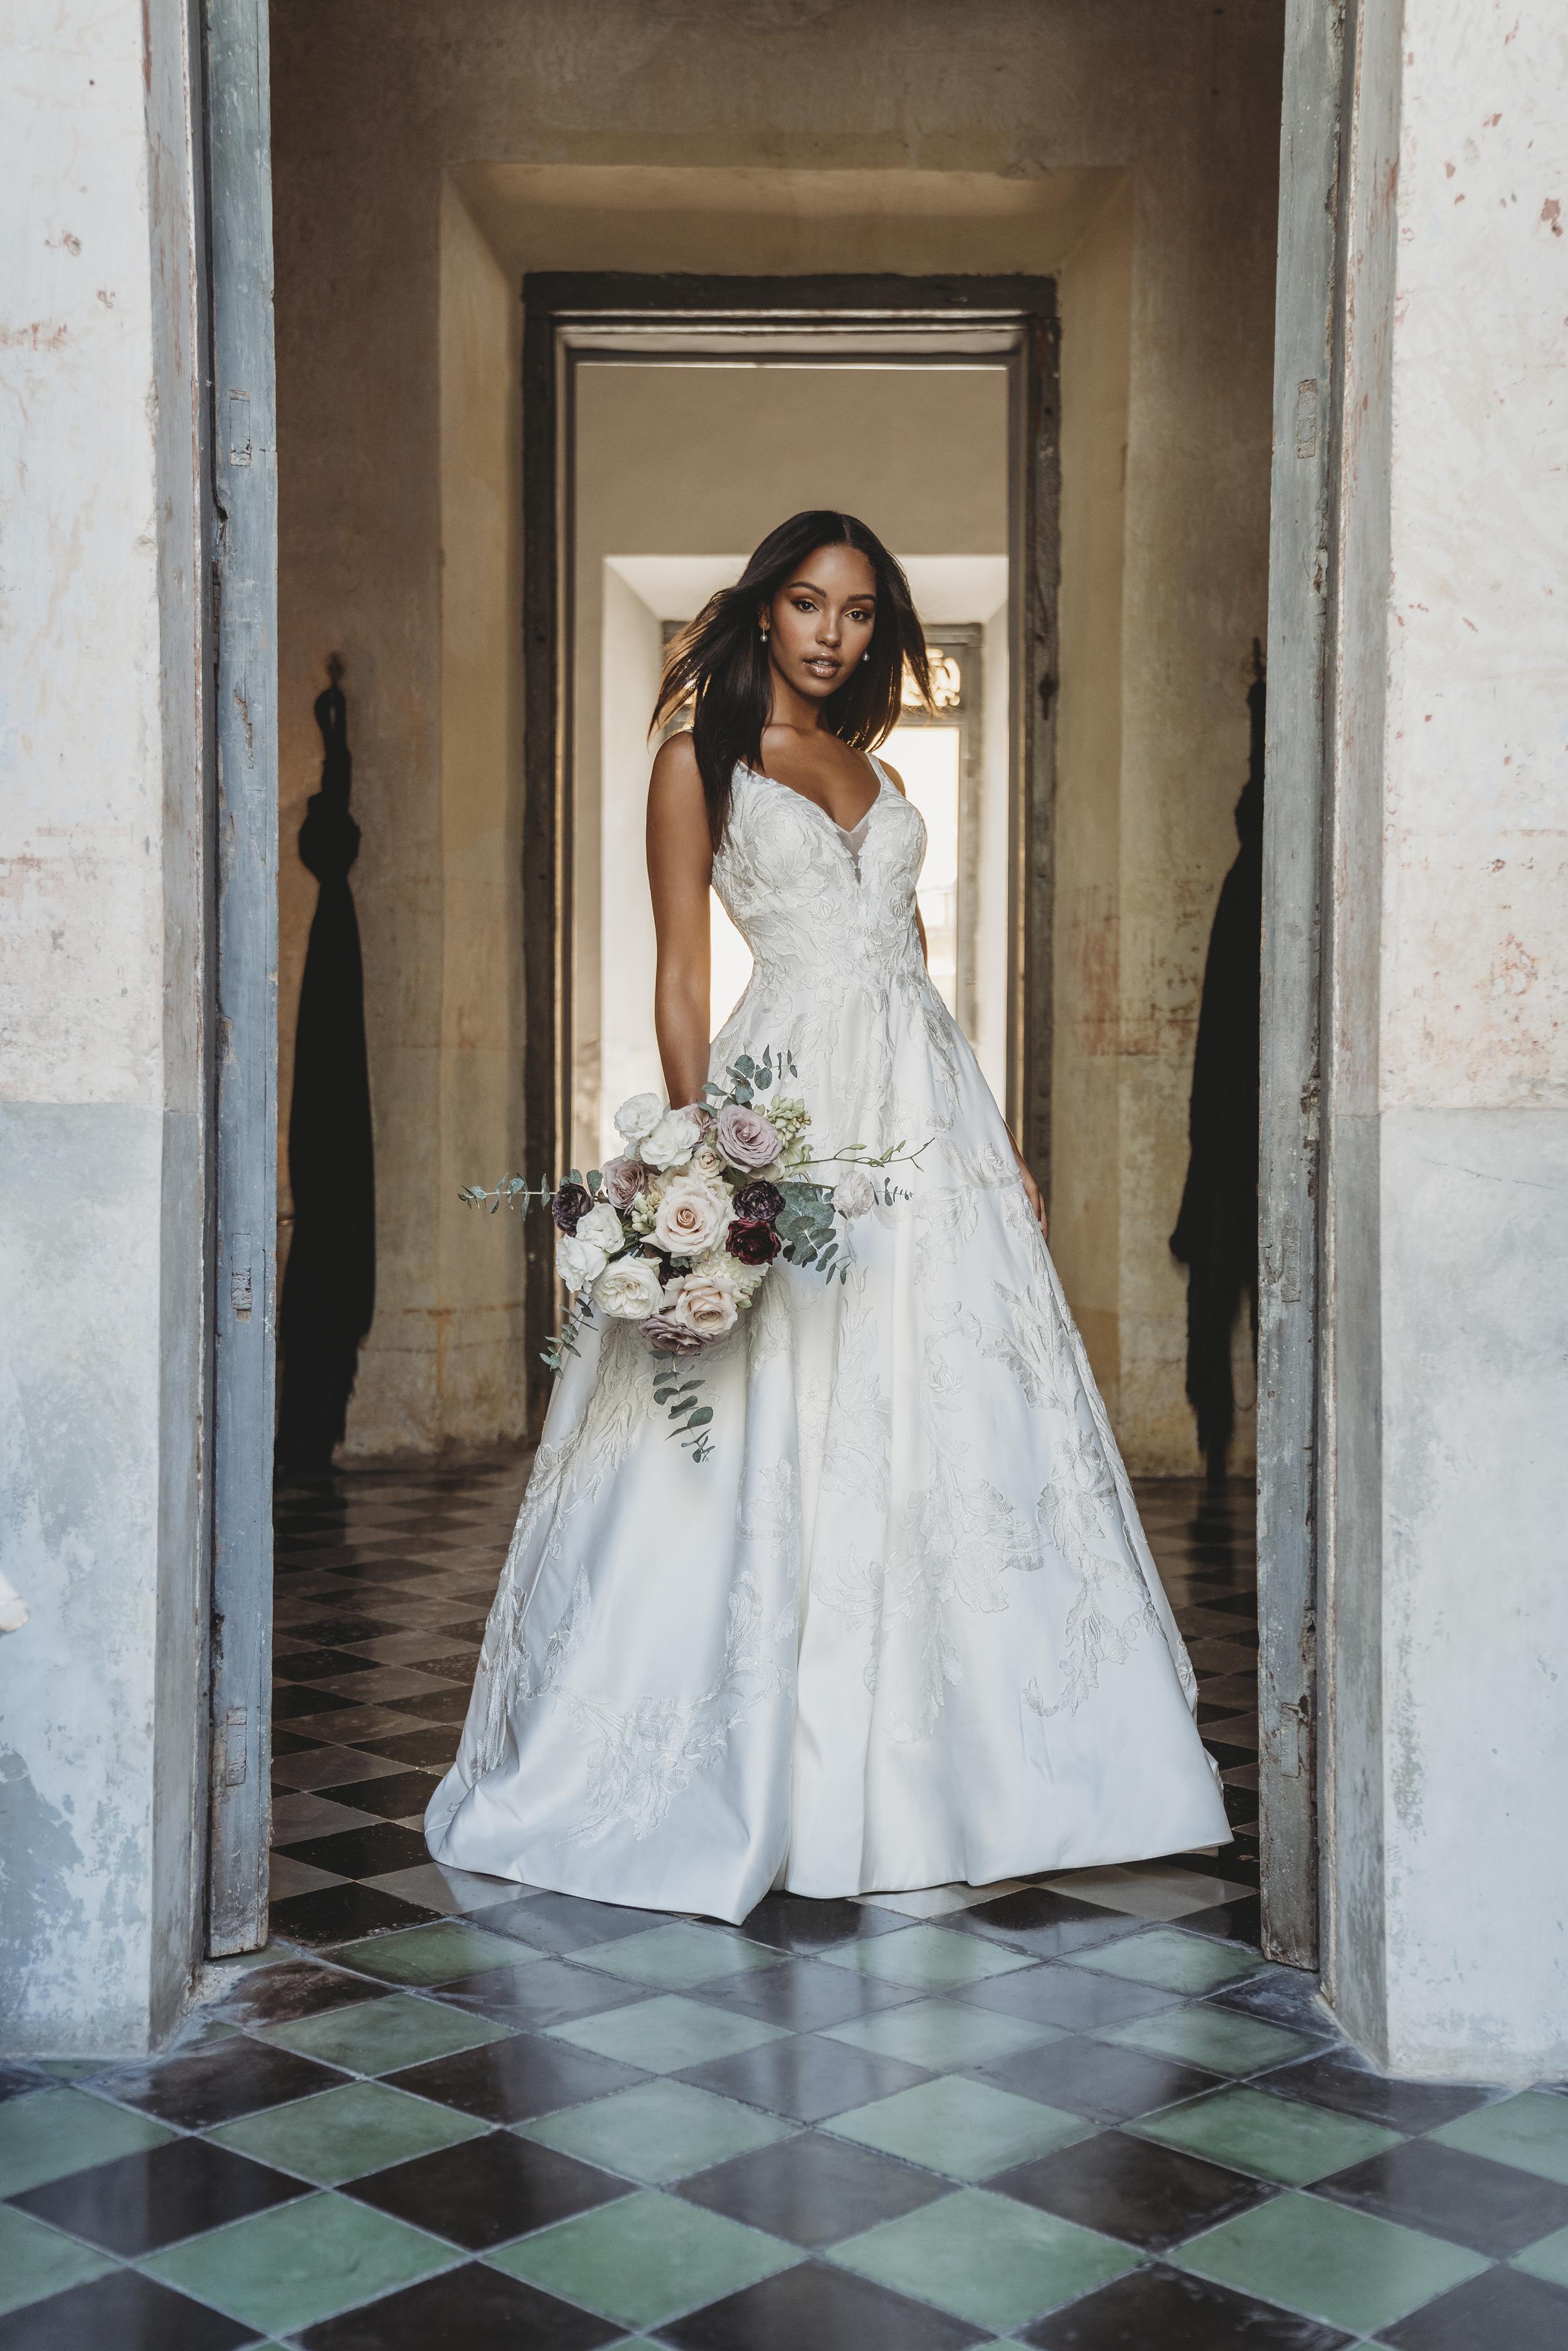 Allure Bridals at Wine Country Bride Boutique